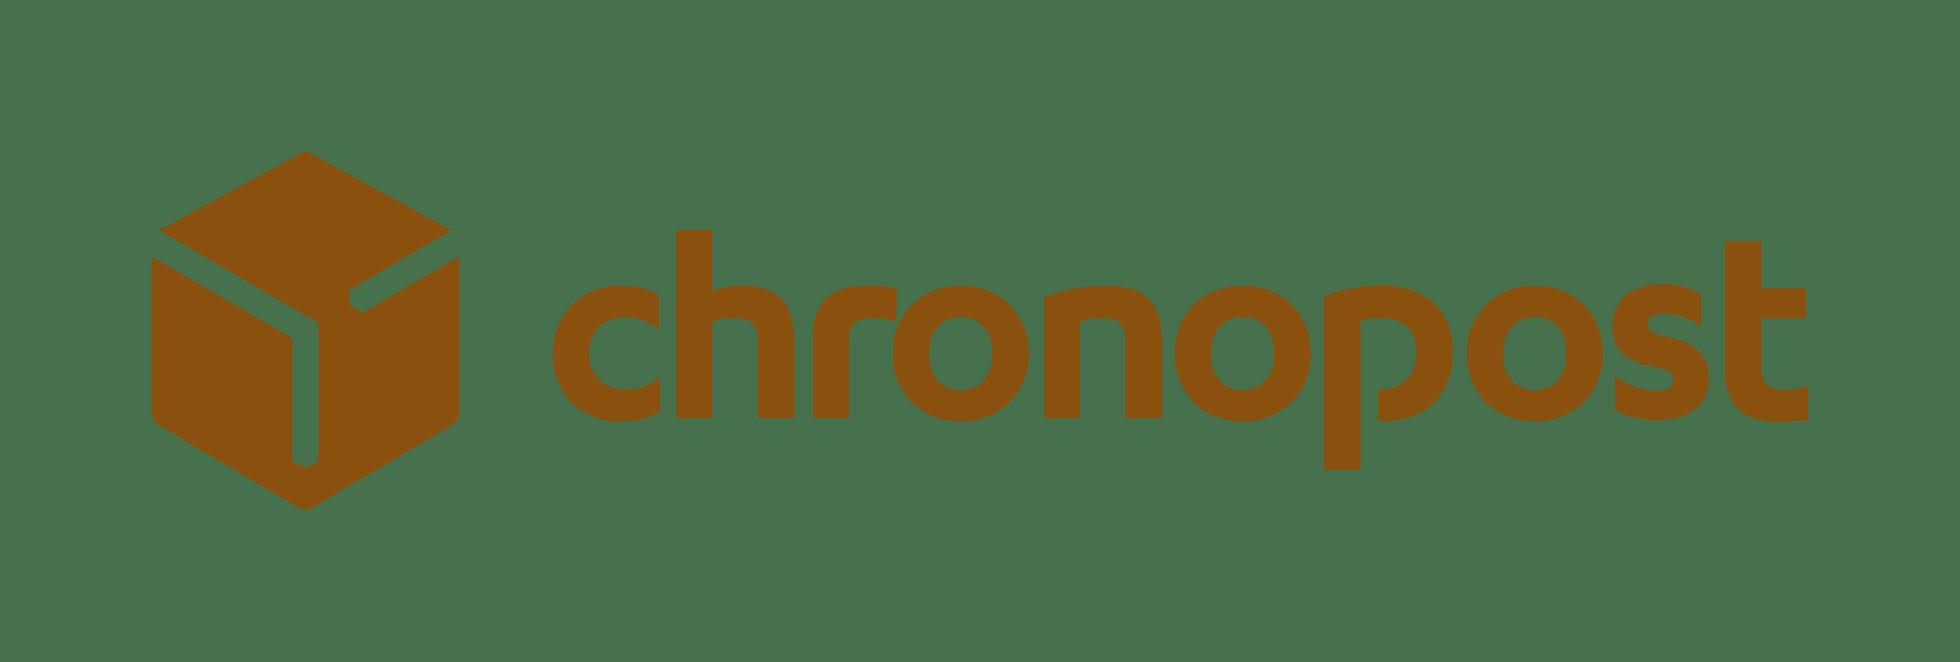 20181201224334Chronopost logo 2015 1